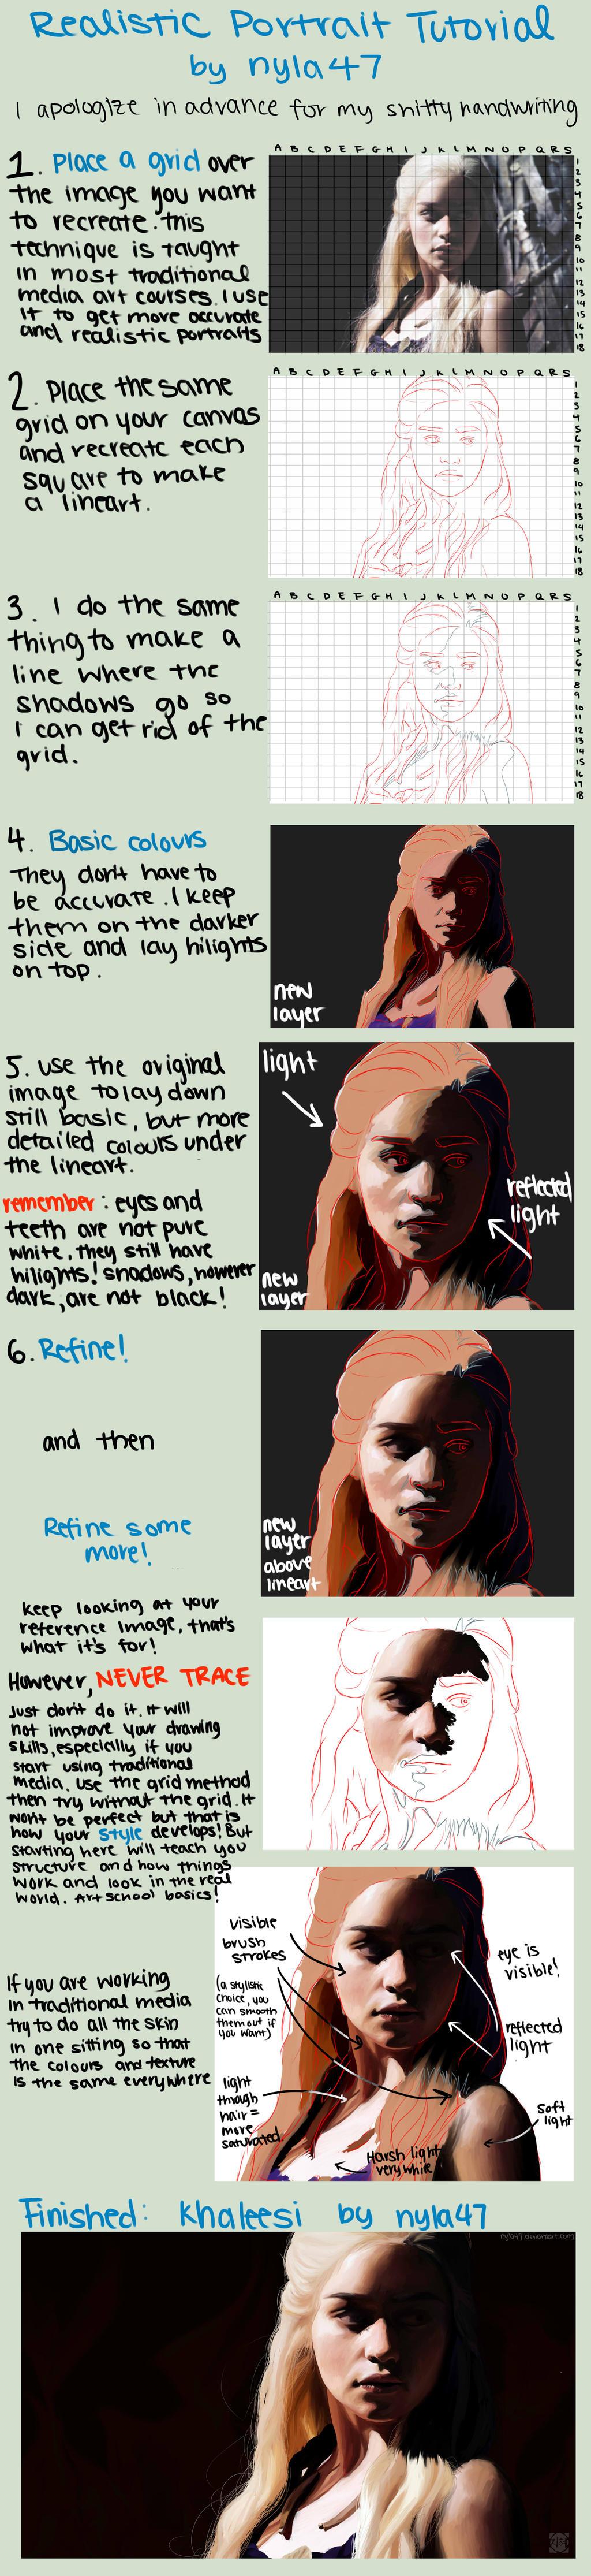 Realistic Portrait Tutorial by HaNJiHye